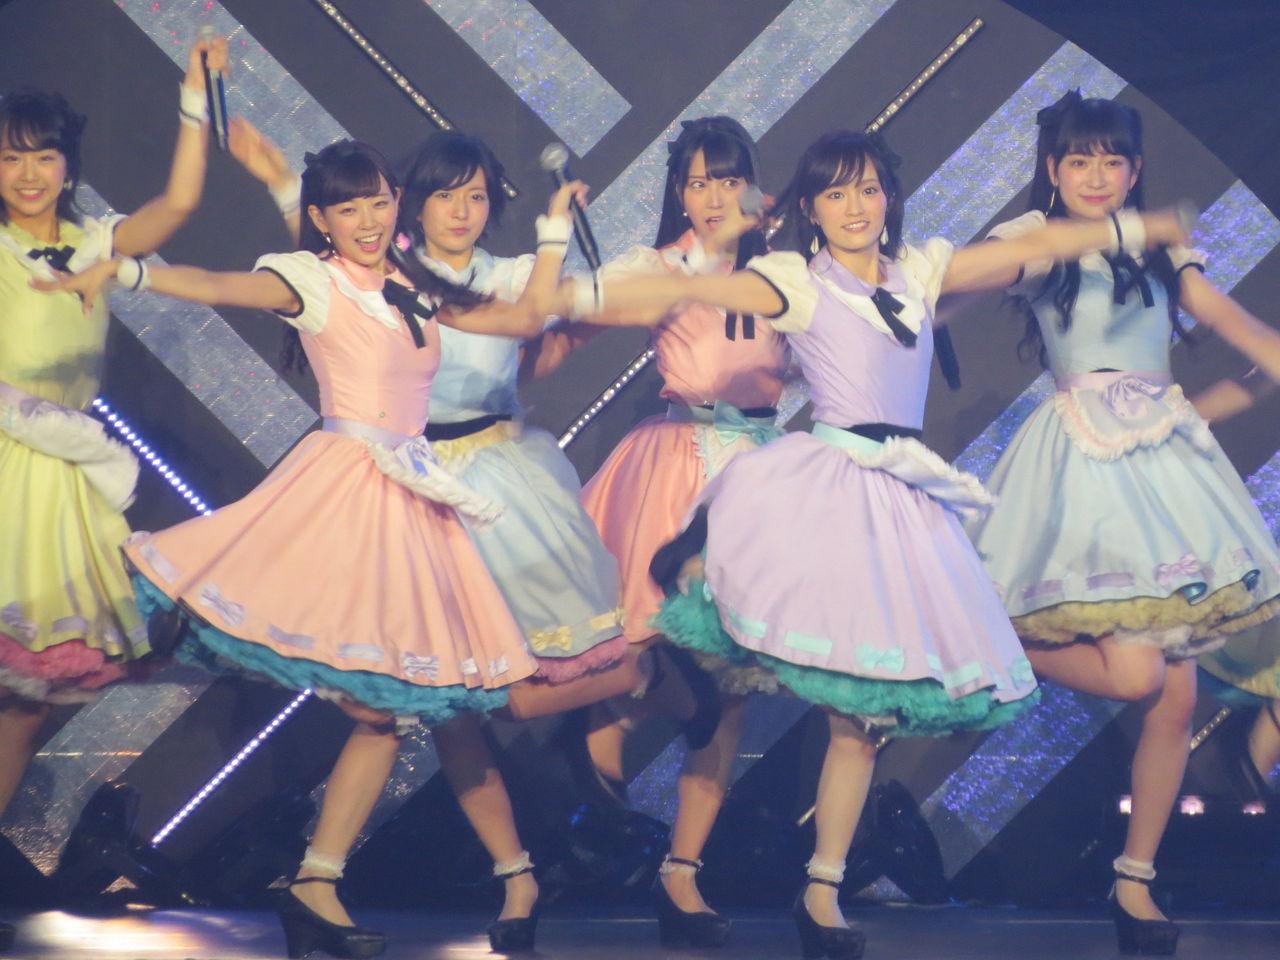 【AKB48オールナイトニッポン】DDはアリ?ナシ?で熱い議論【須藤凜々花/大場美奈/惣田紗莉渚】